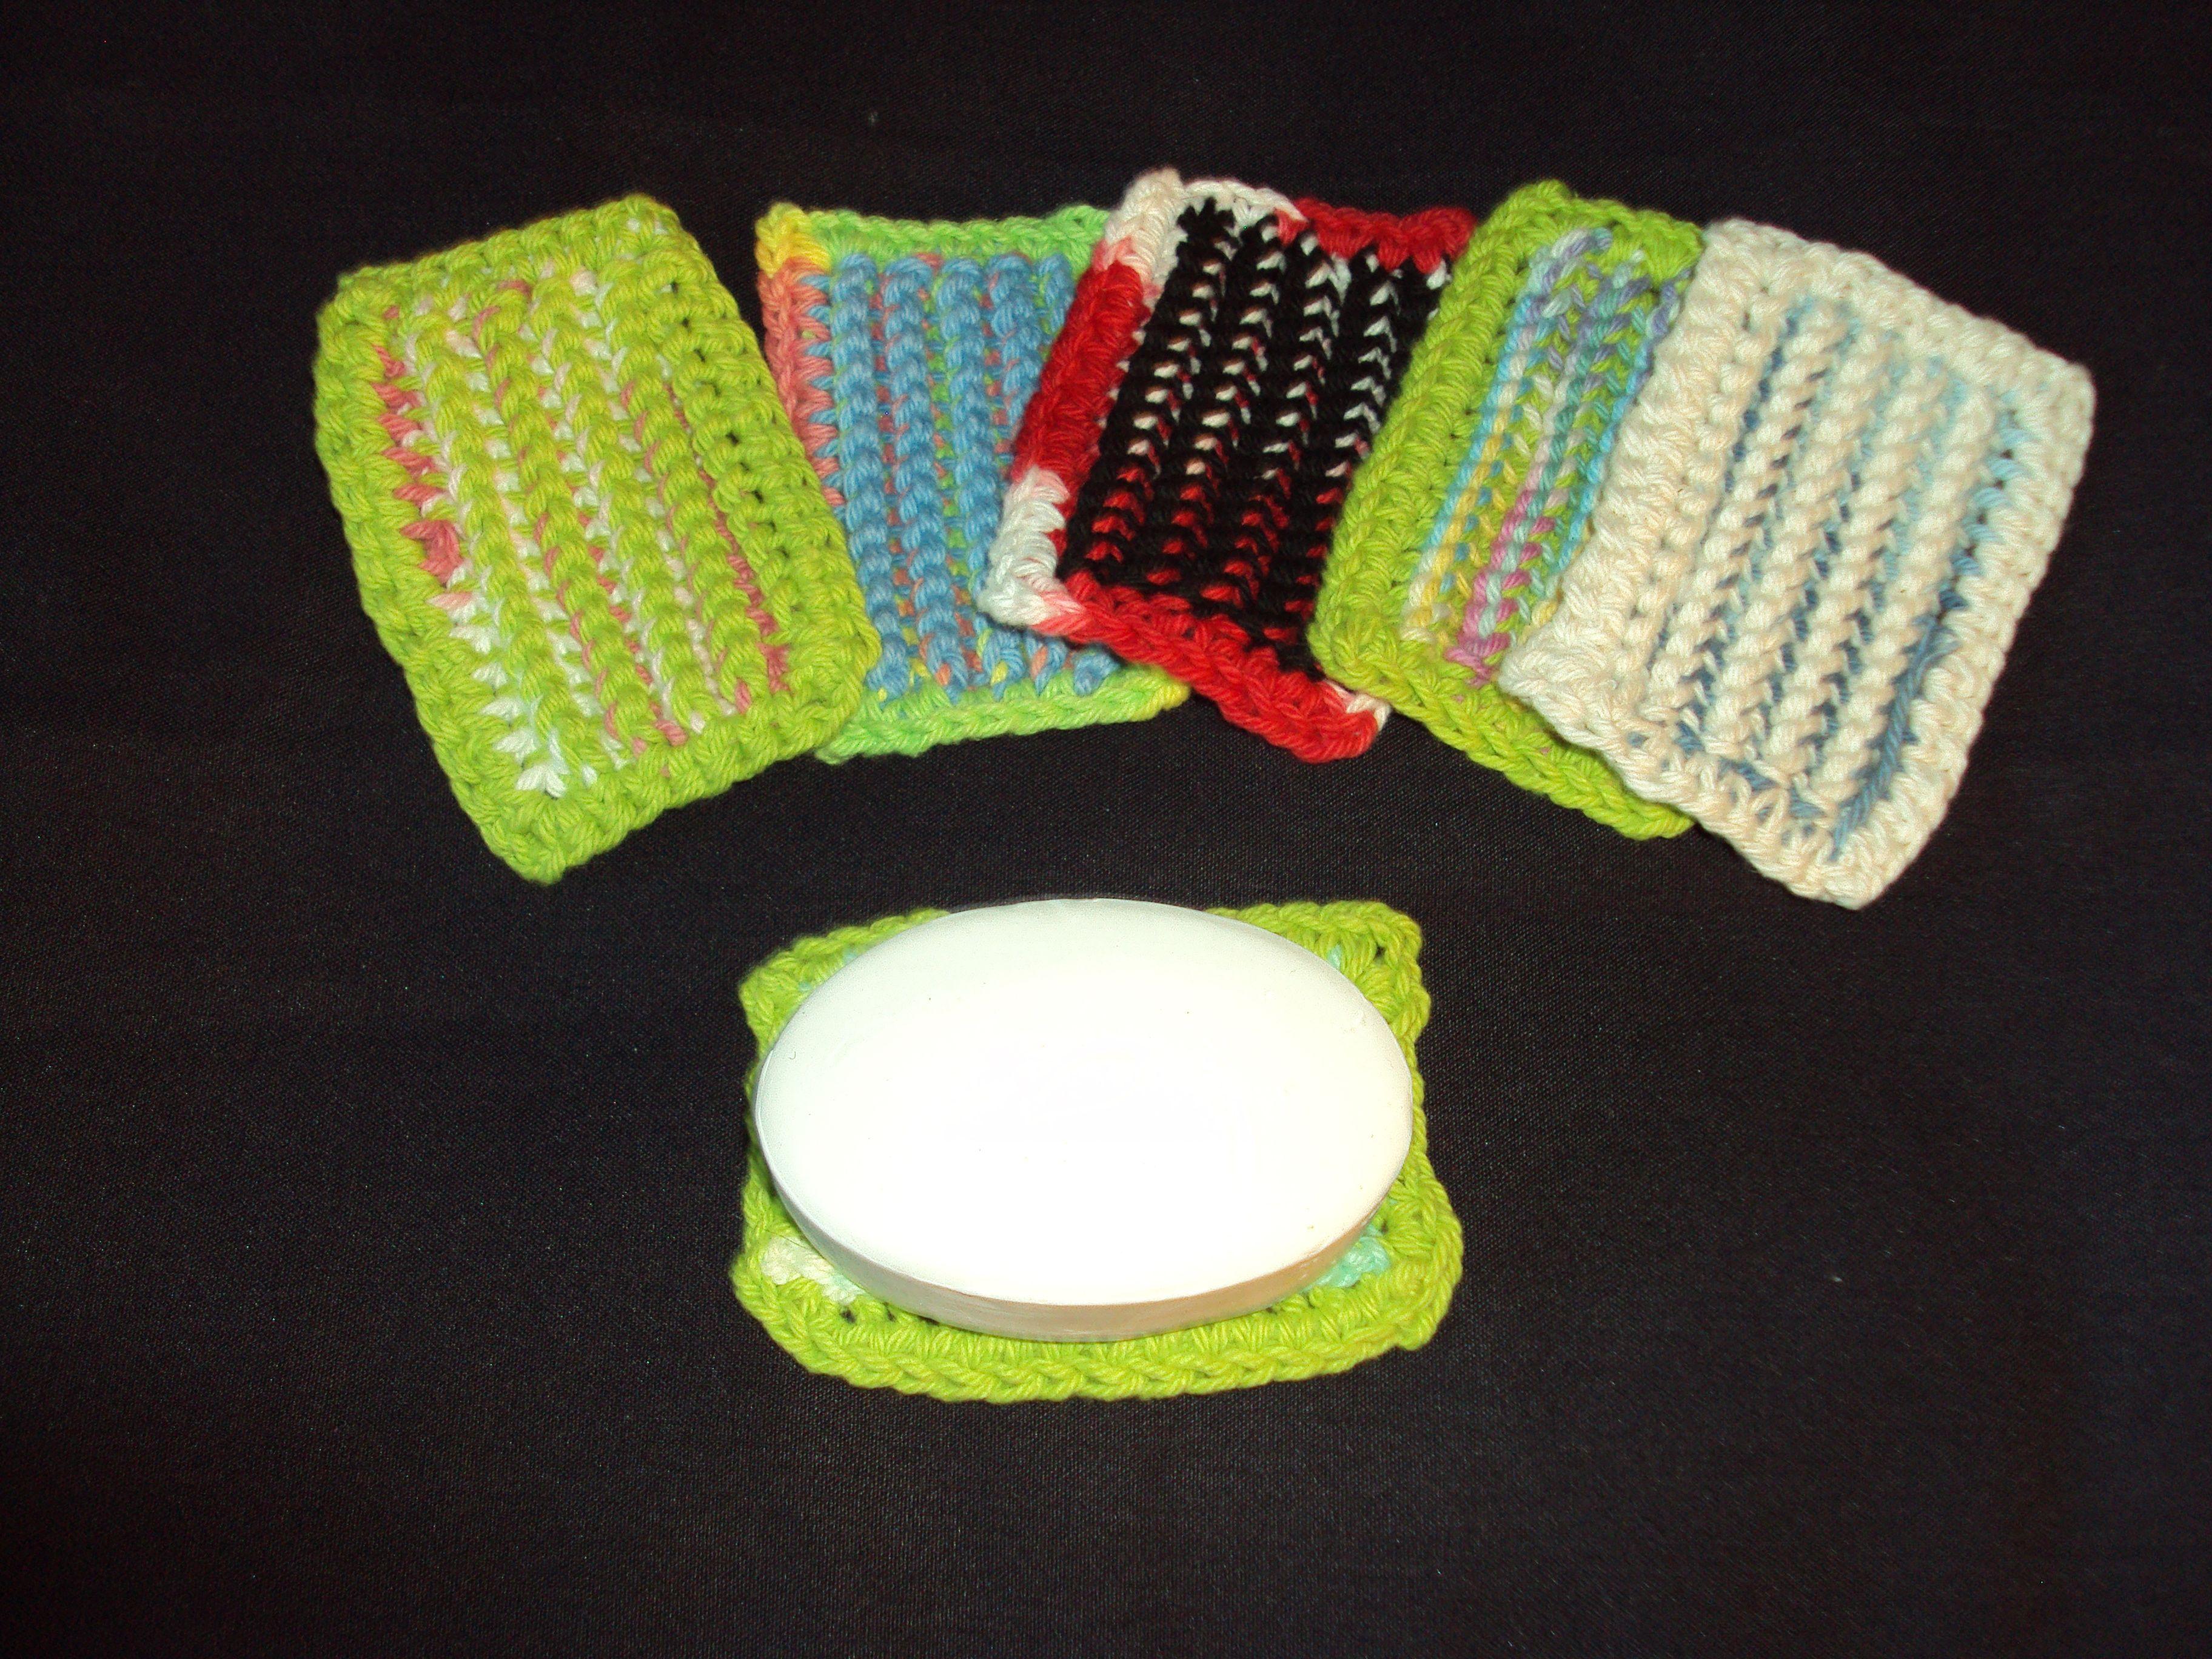 Crochet Soap Savers